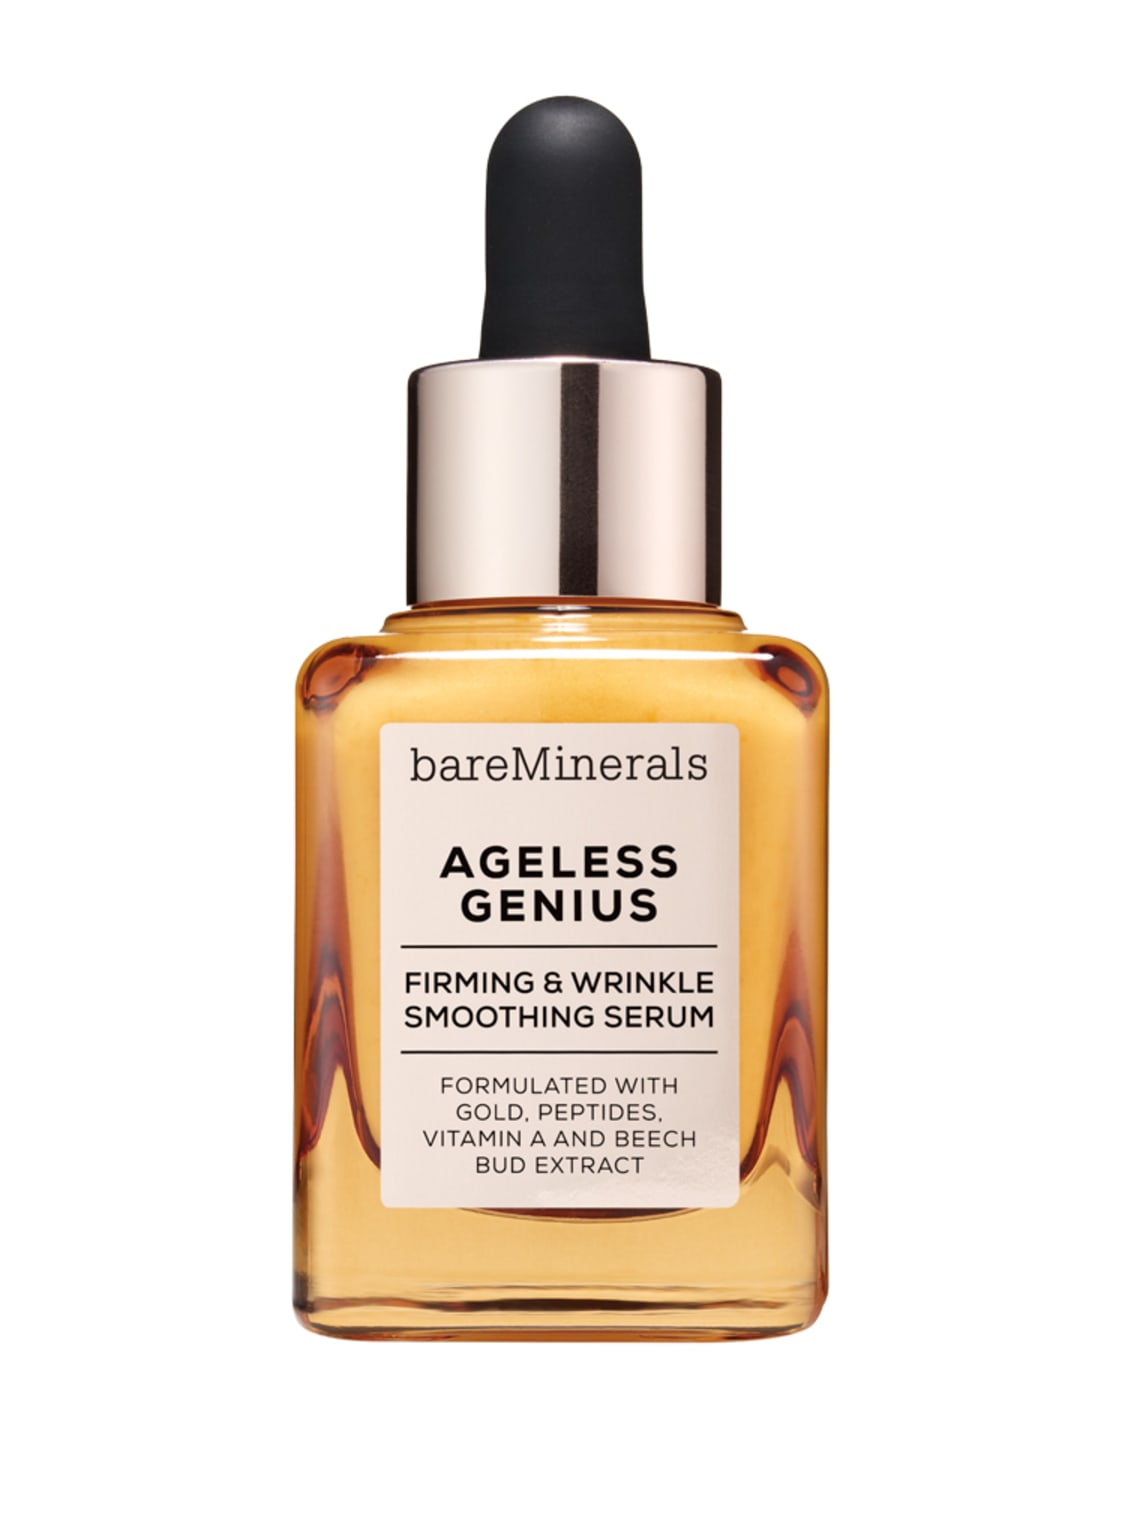 Image of Bareminerals Ageless Genius Firming & Wrinkle Smoothing Serum 30 ml